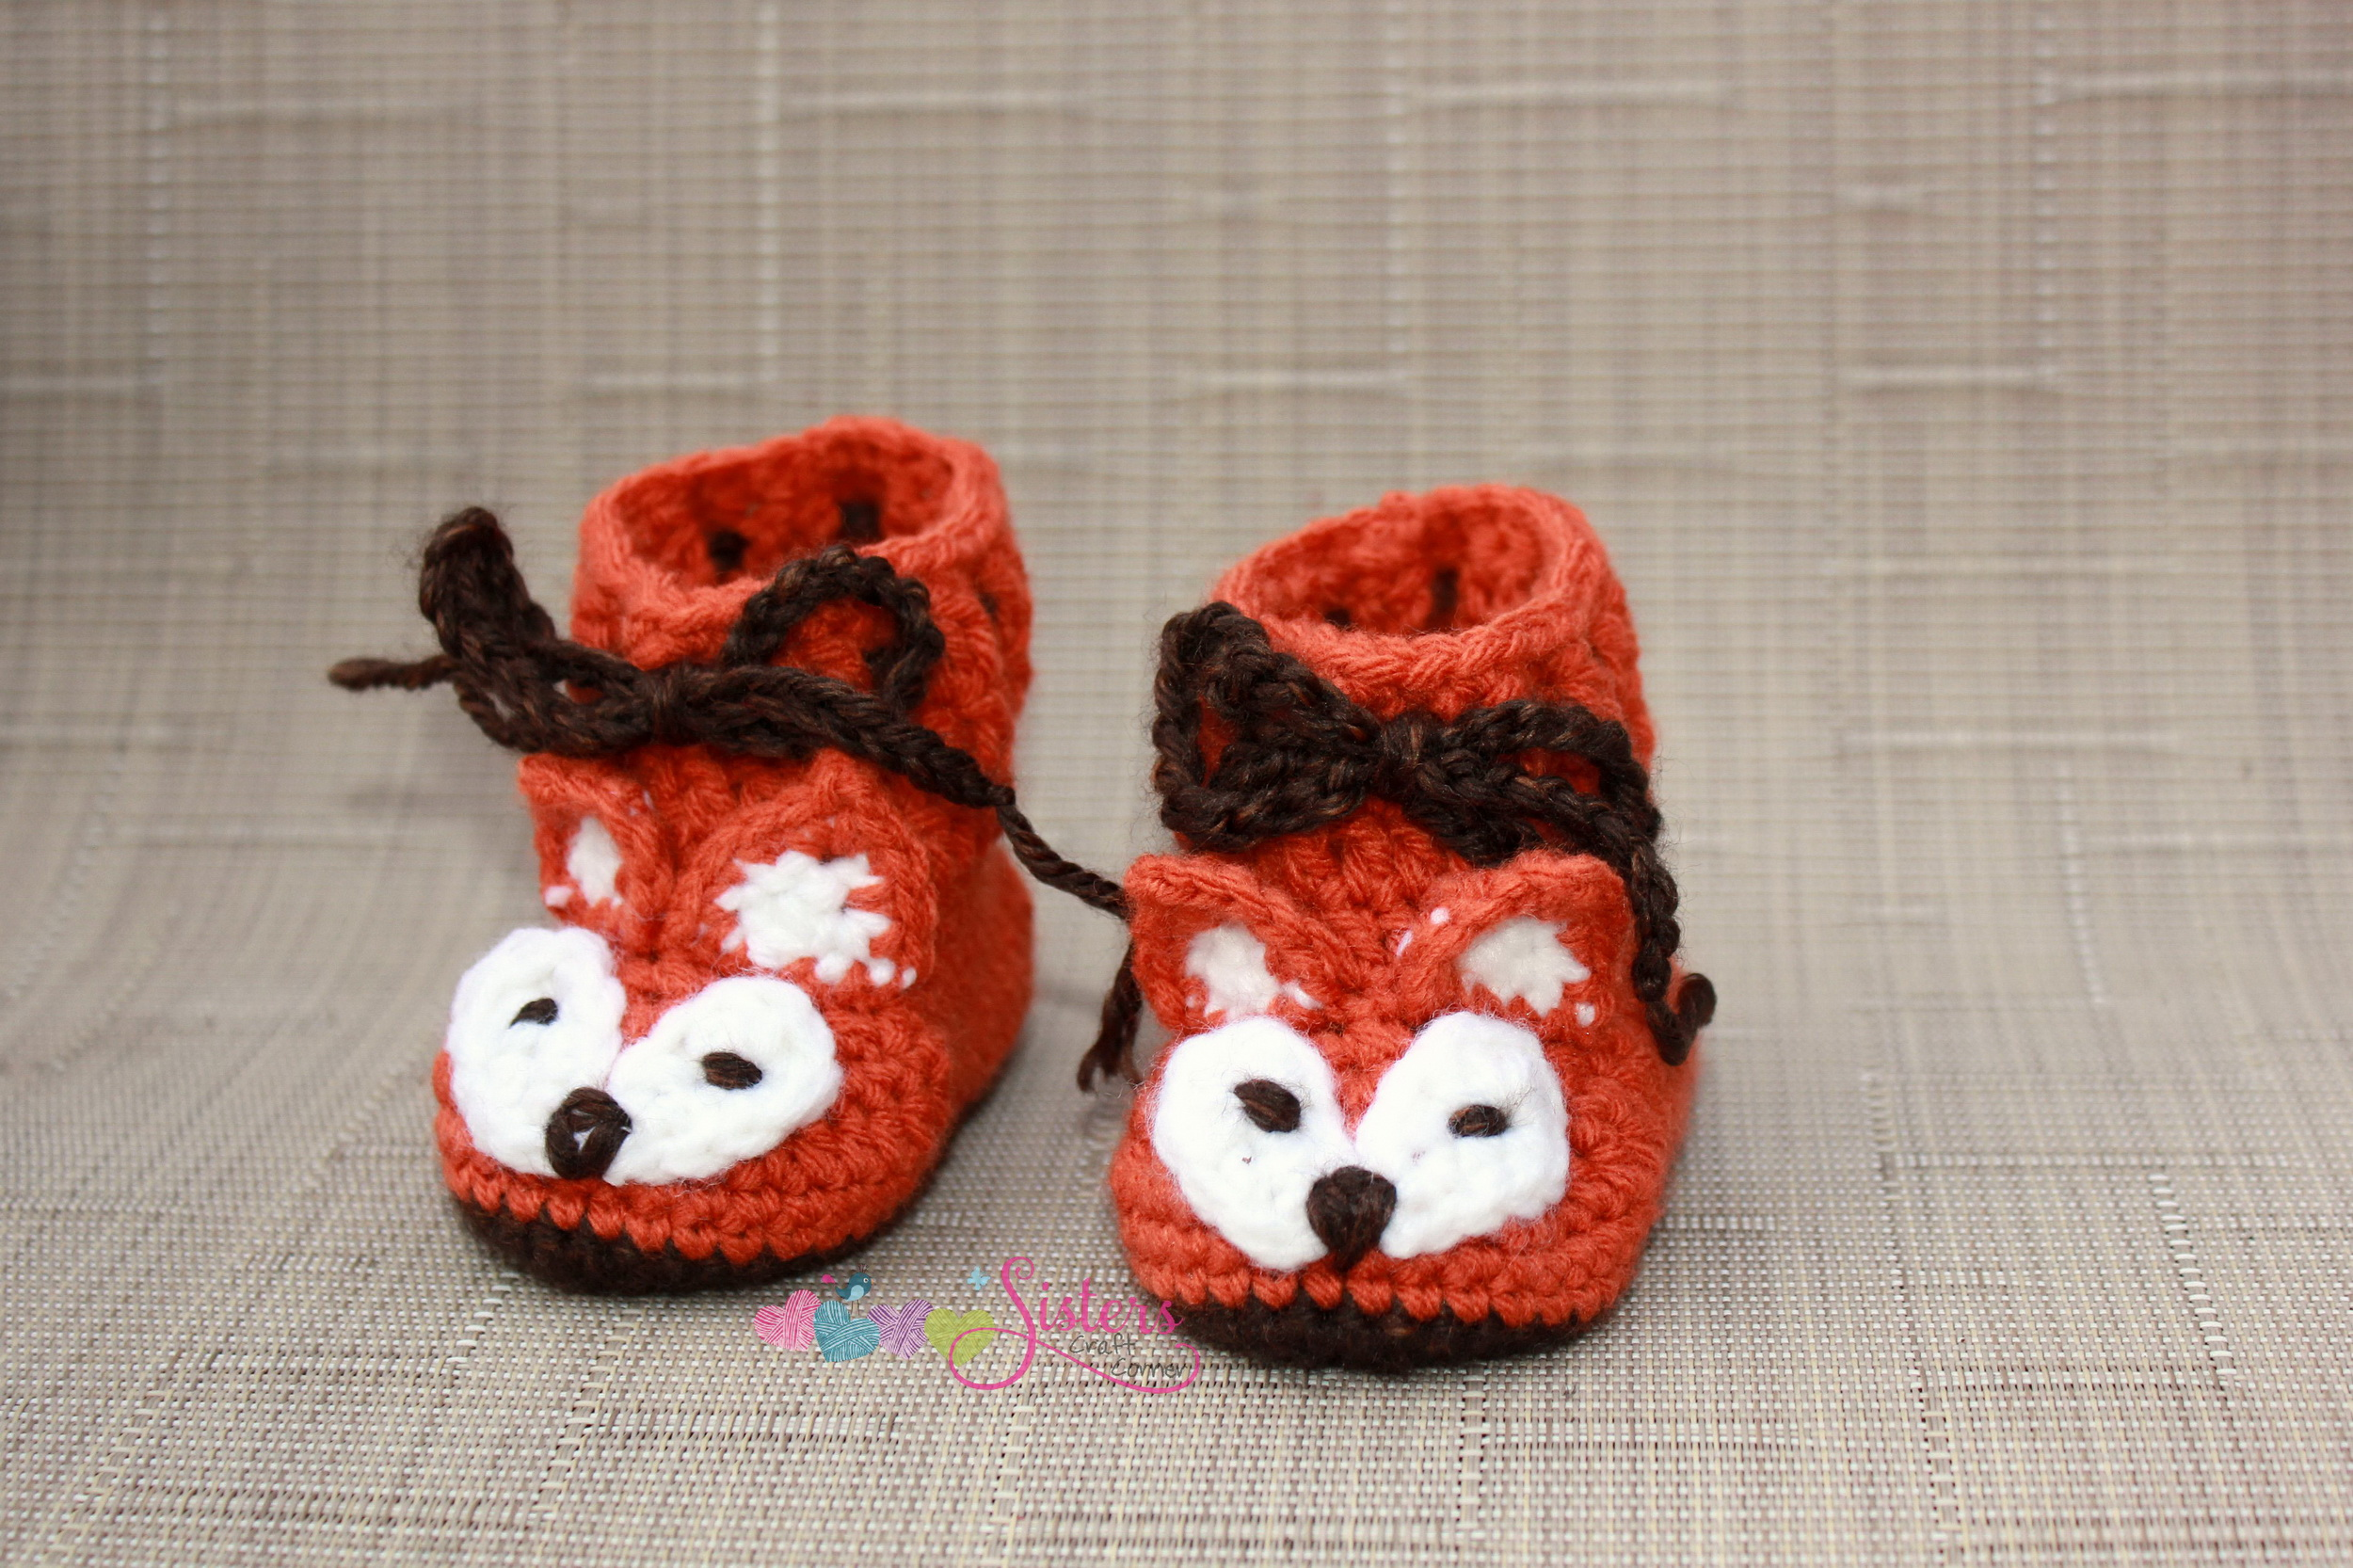 ba5575b0c48f6 Baby Fox Booties, Crochet Baby Boots Baby Booties, Crochet Boots, Baby,  Baby Shower Gift, Orange, Brown, White